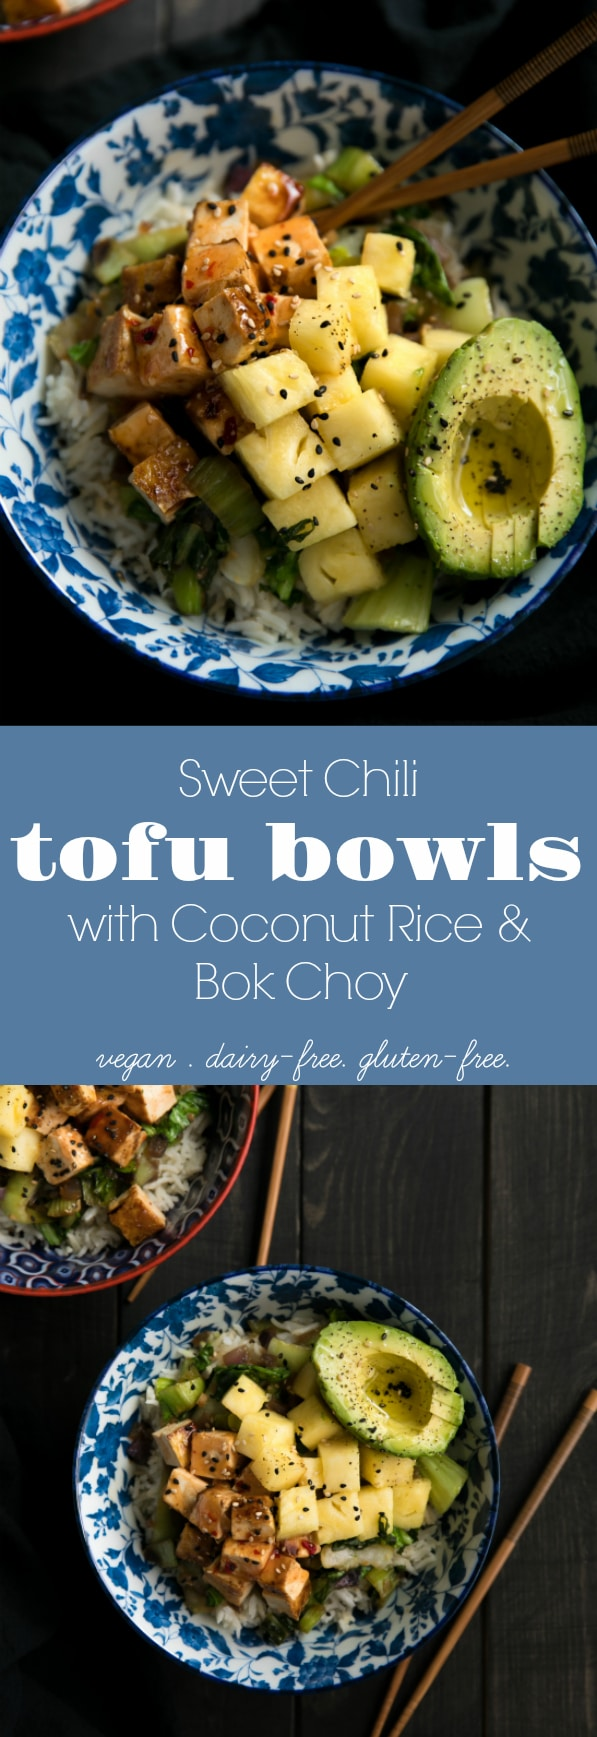 Sweet Chili Tofu Bowls with Coconut Rice and Bok Choy via @theforkedspoon #vegetarian #tofu #ricebowl #coconutmilk #rice #easyrecipe #healthy #vegan #dairyfree #glutenfree